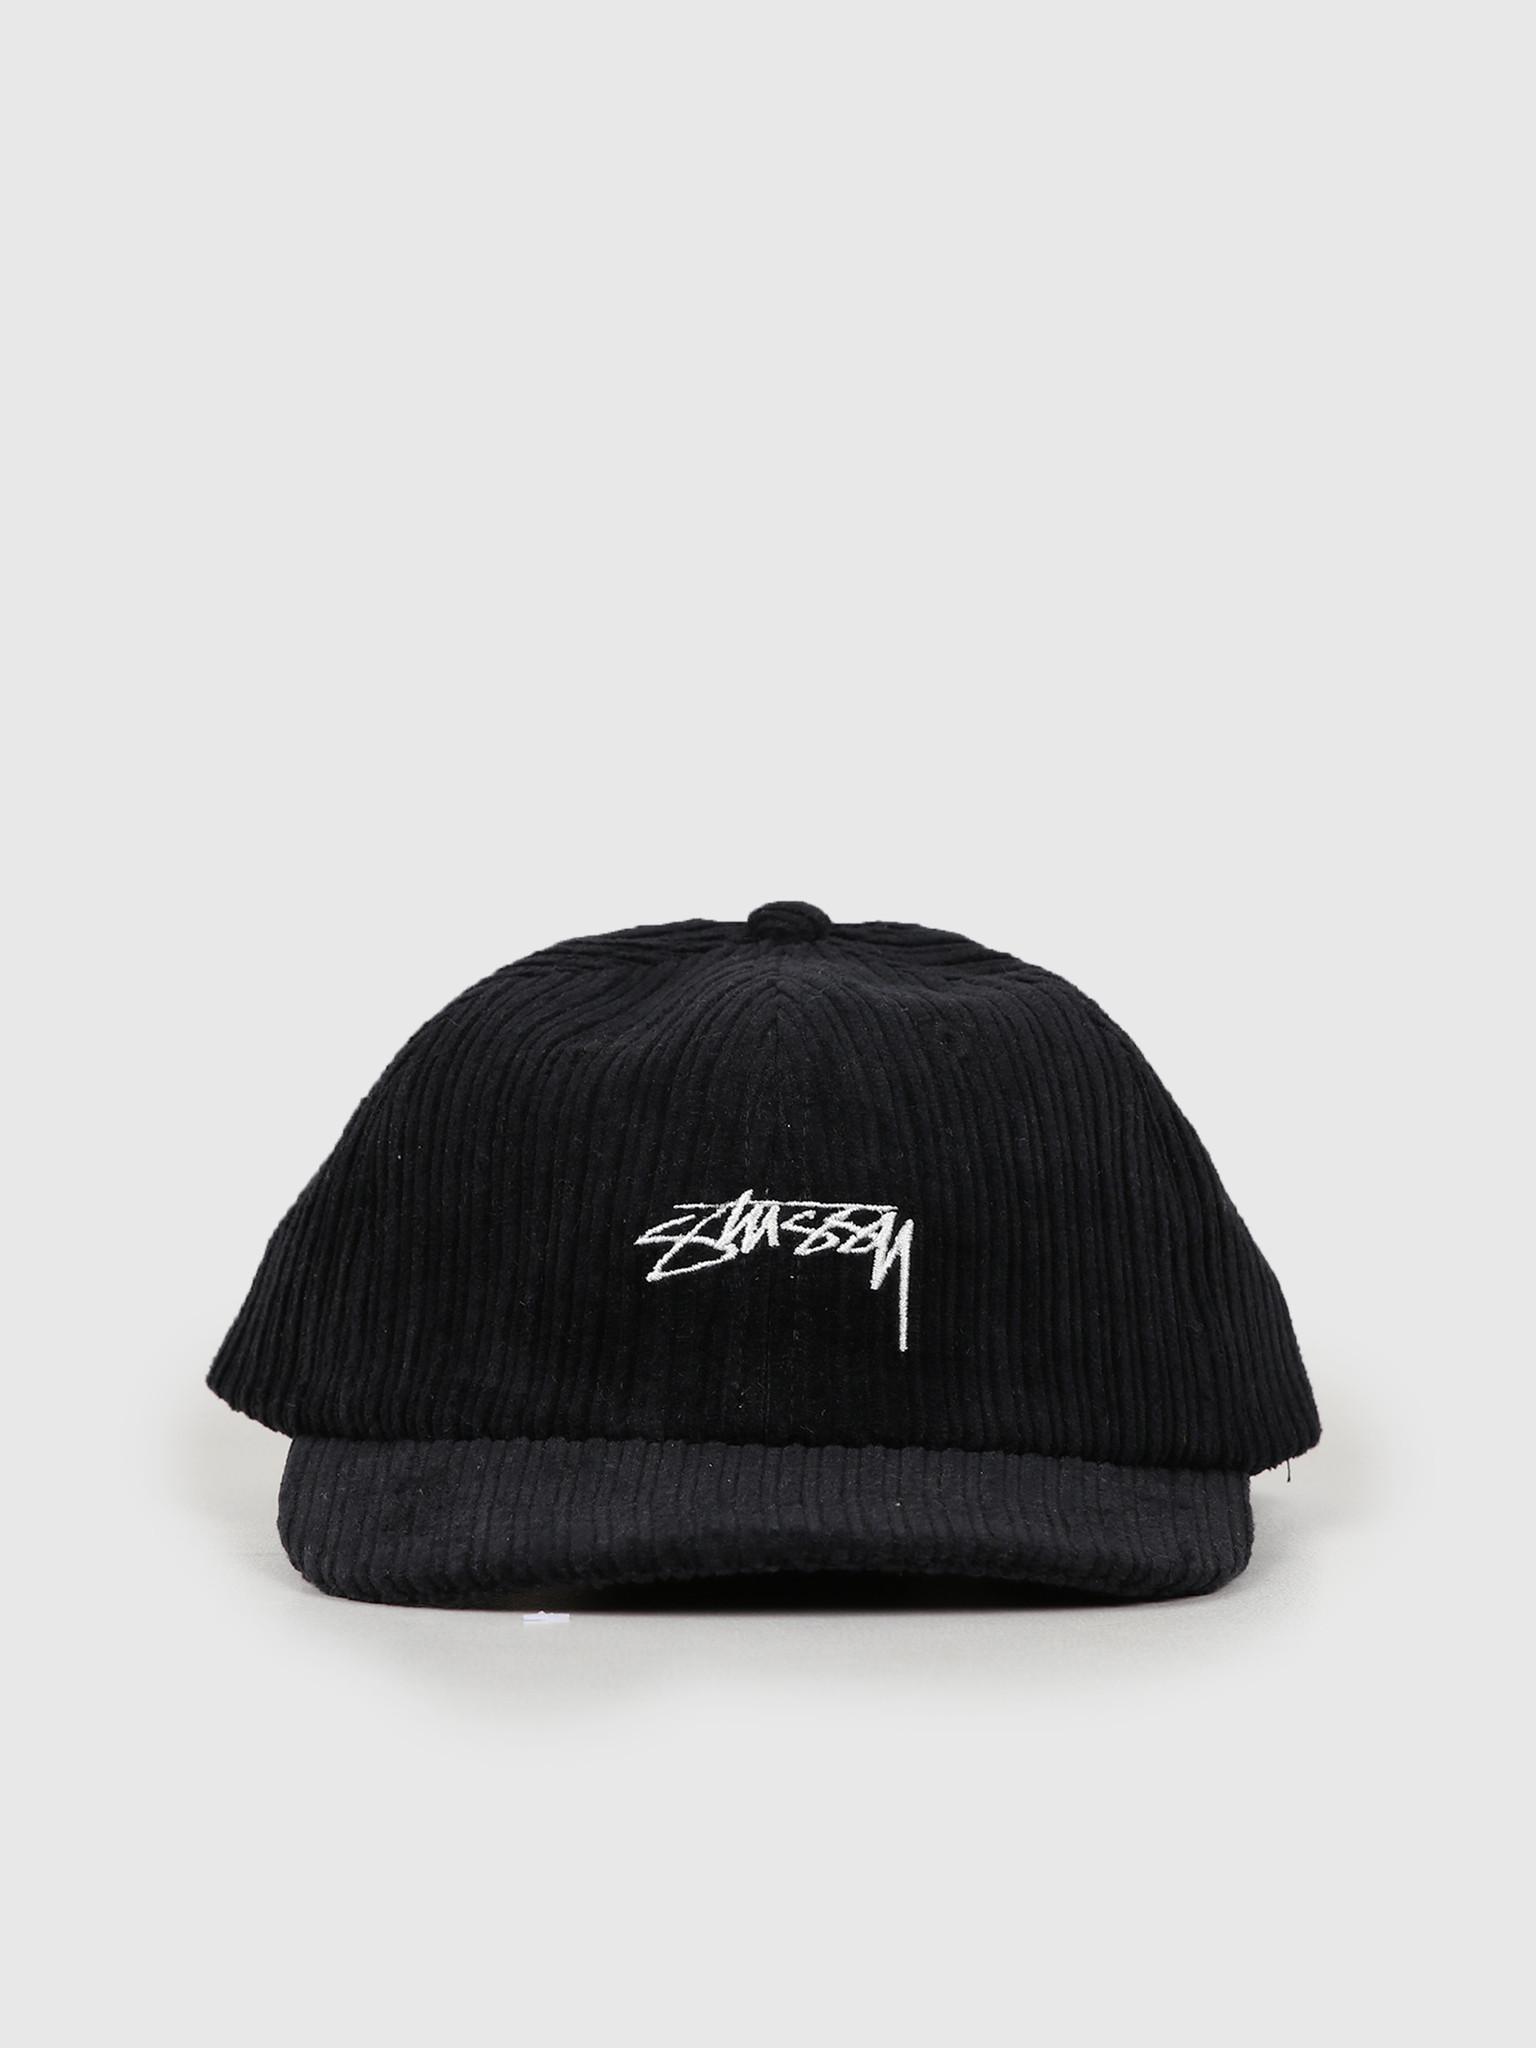 Stussy Stussy Ho19 Cord Low Pro Cap Black 131919